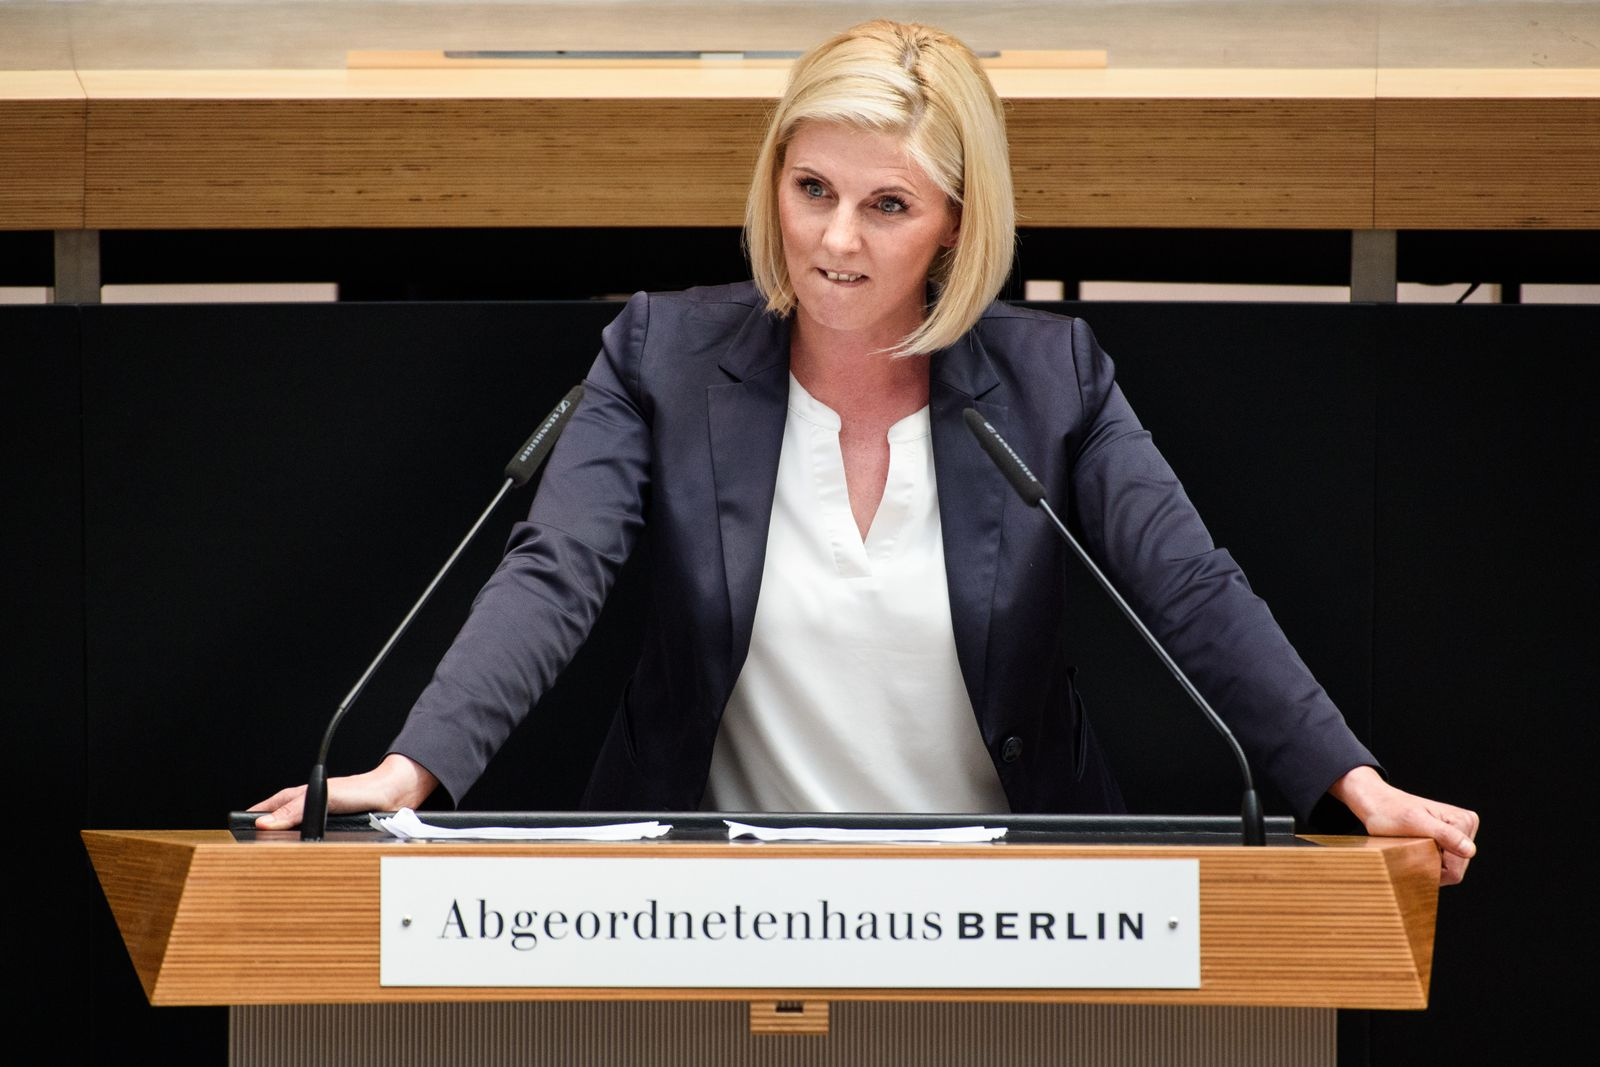 Jessica Bießmann